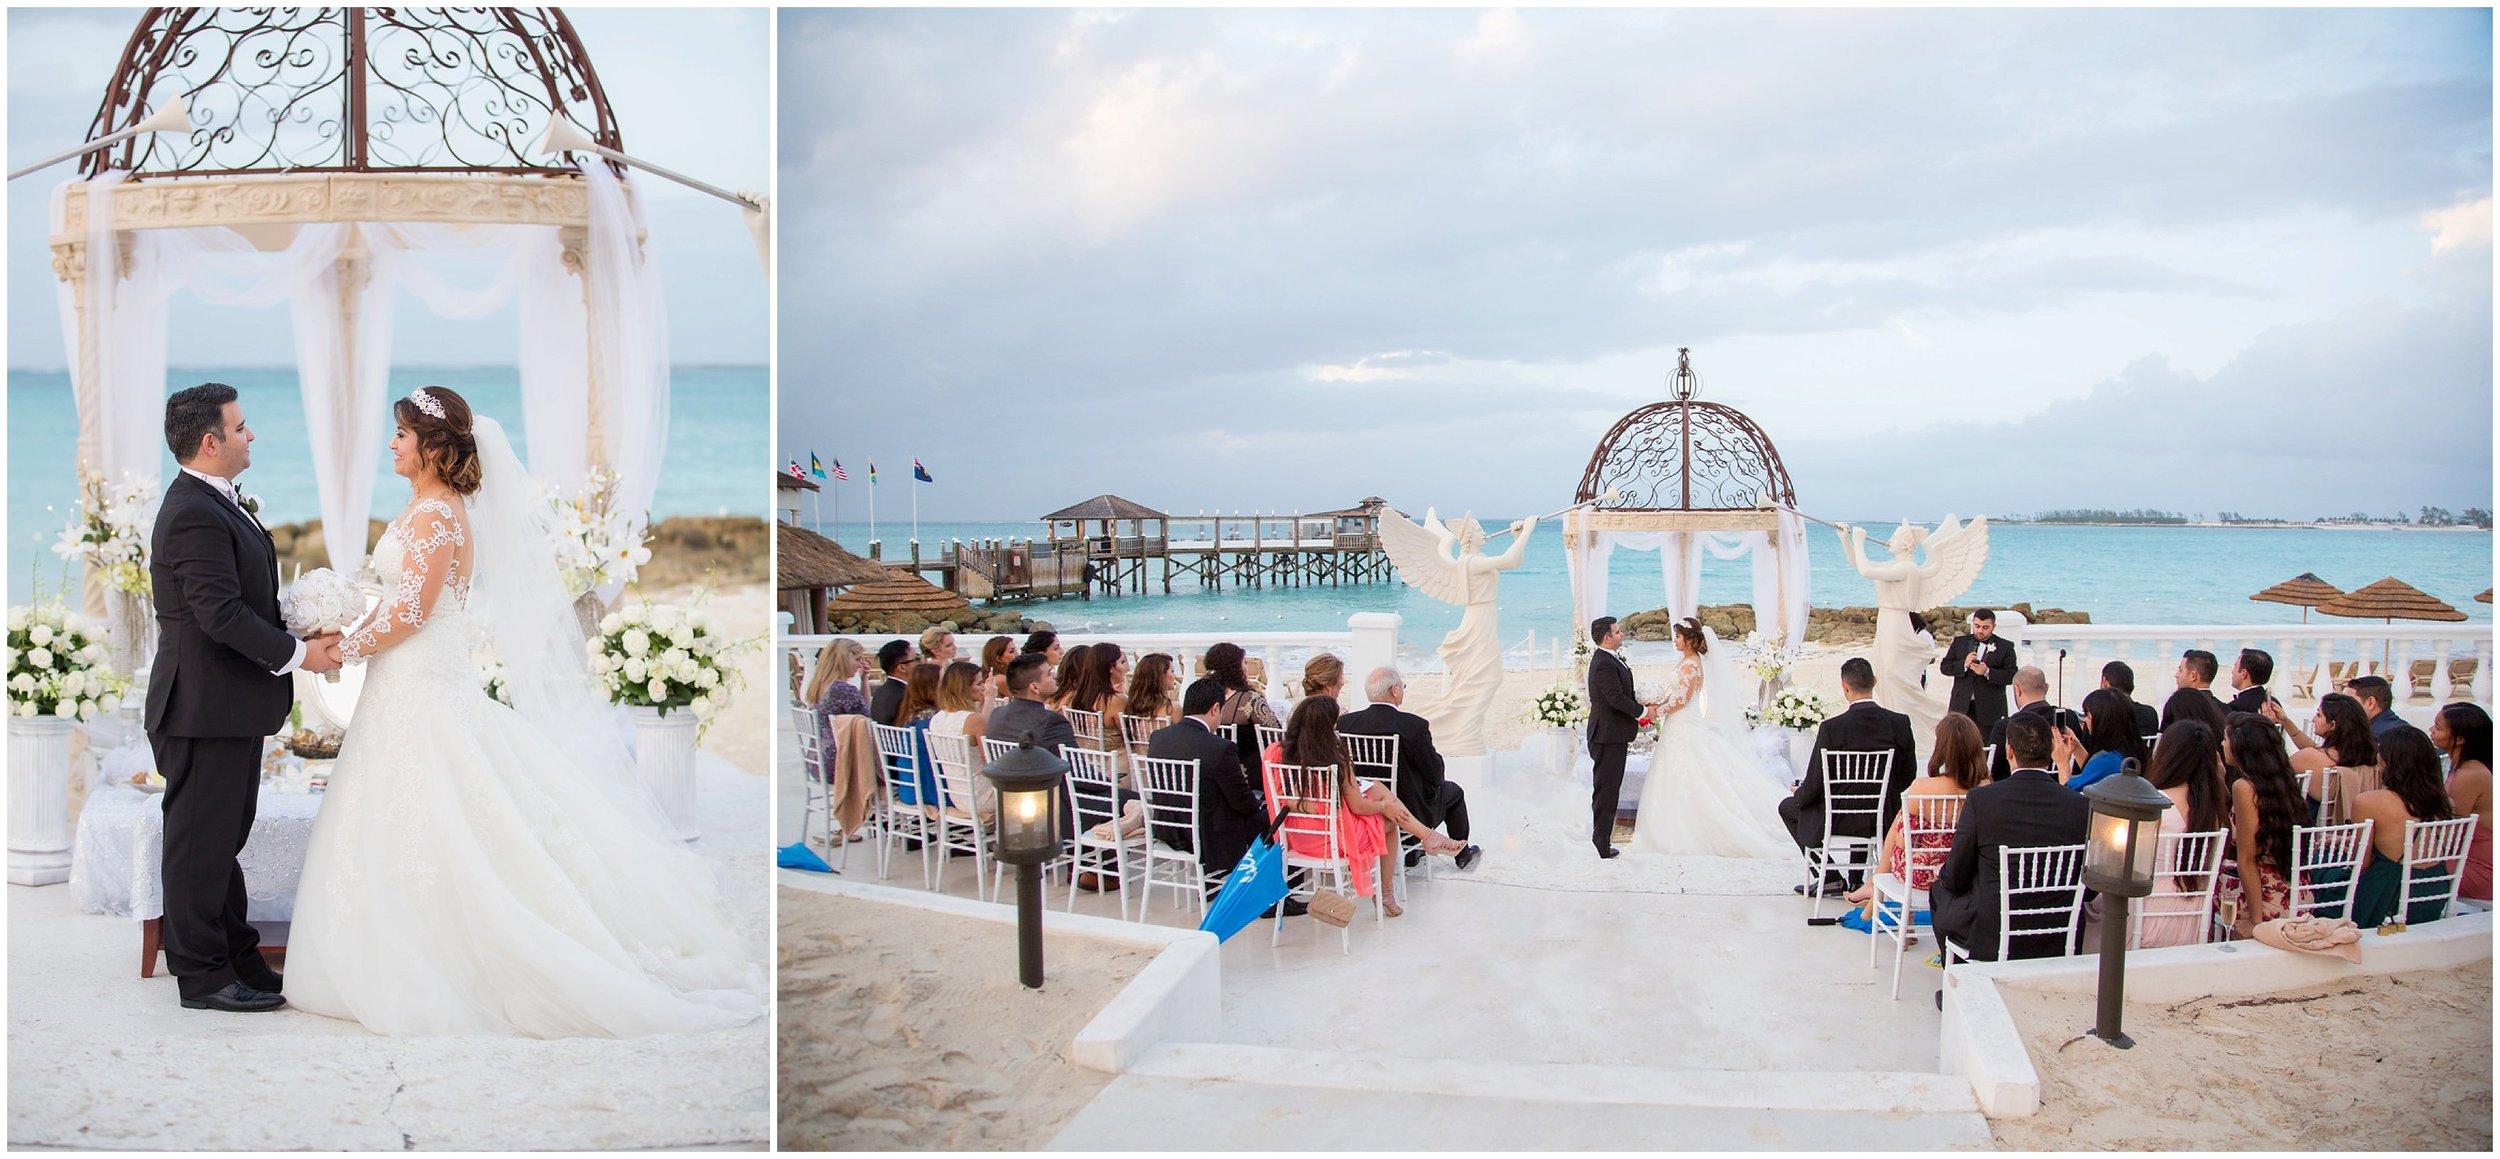 Le Cape Weddings- Destination Wedding Photography -ShayanandNikkie-B-13-X3_LuxuryDestinationPhotographer.jpg